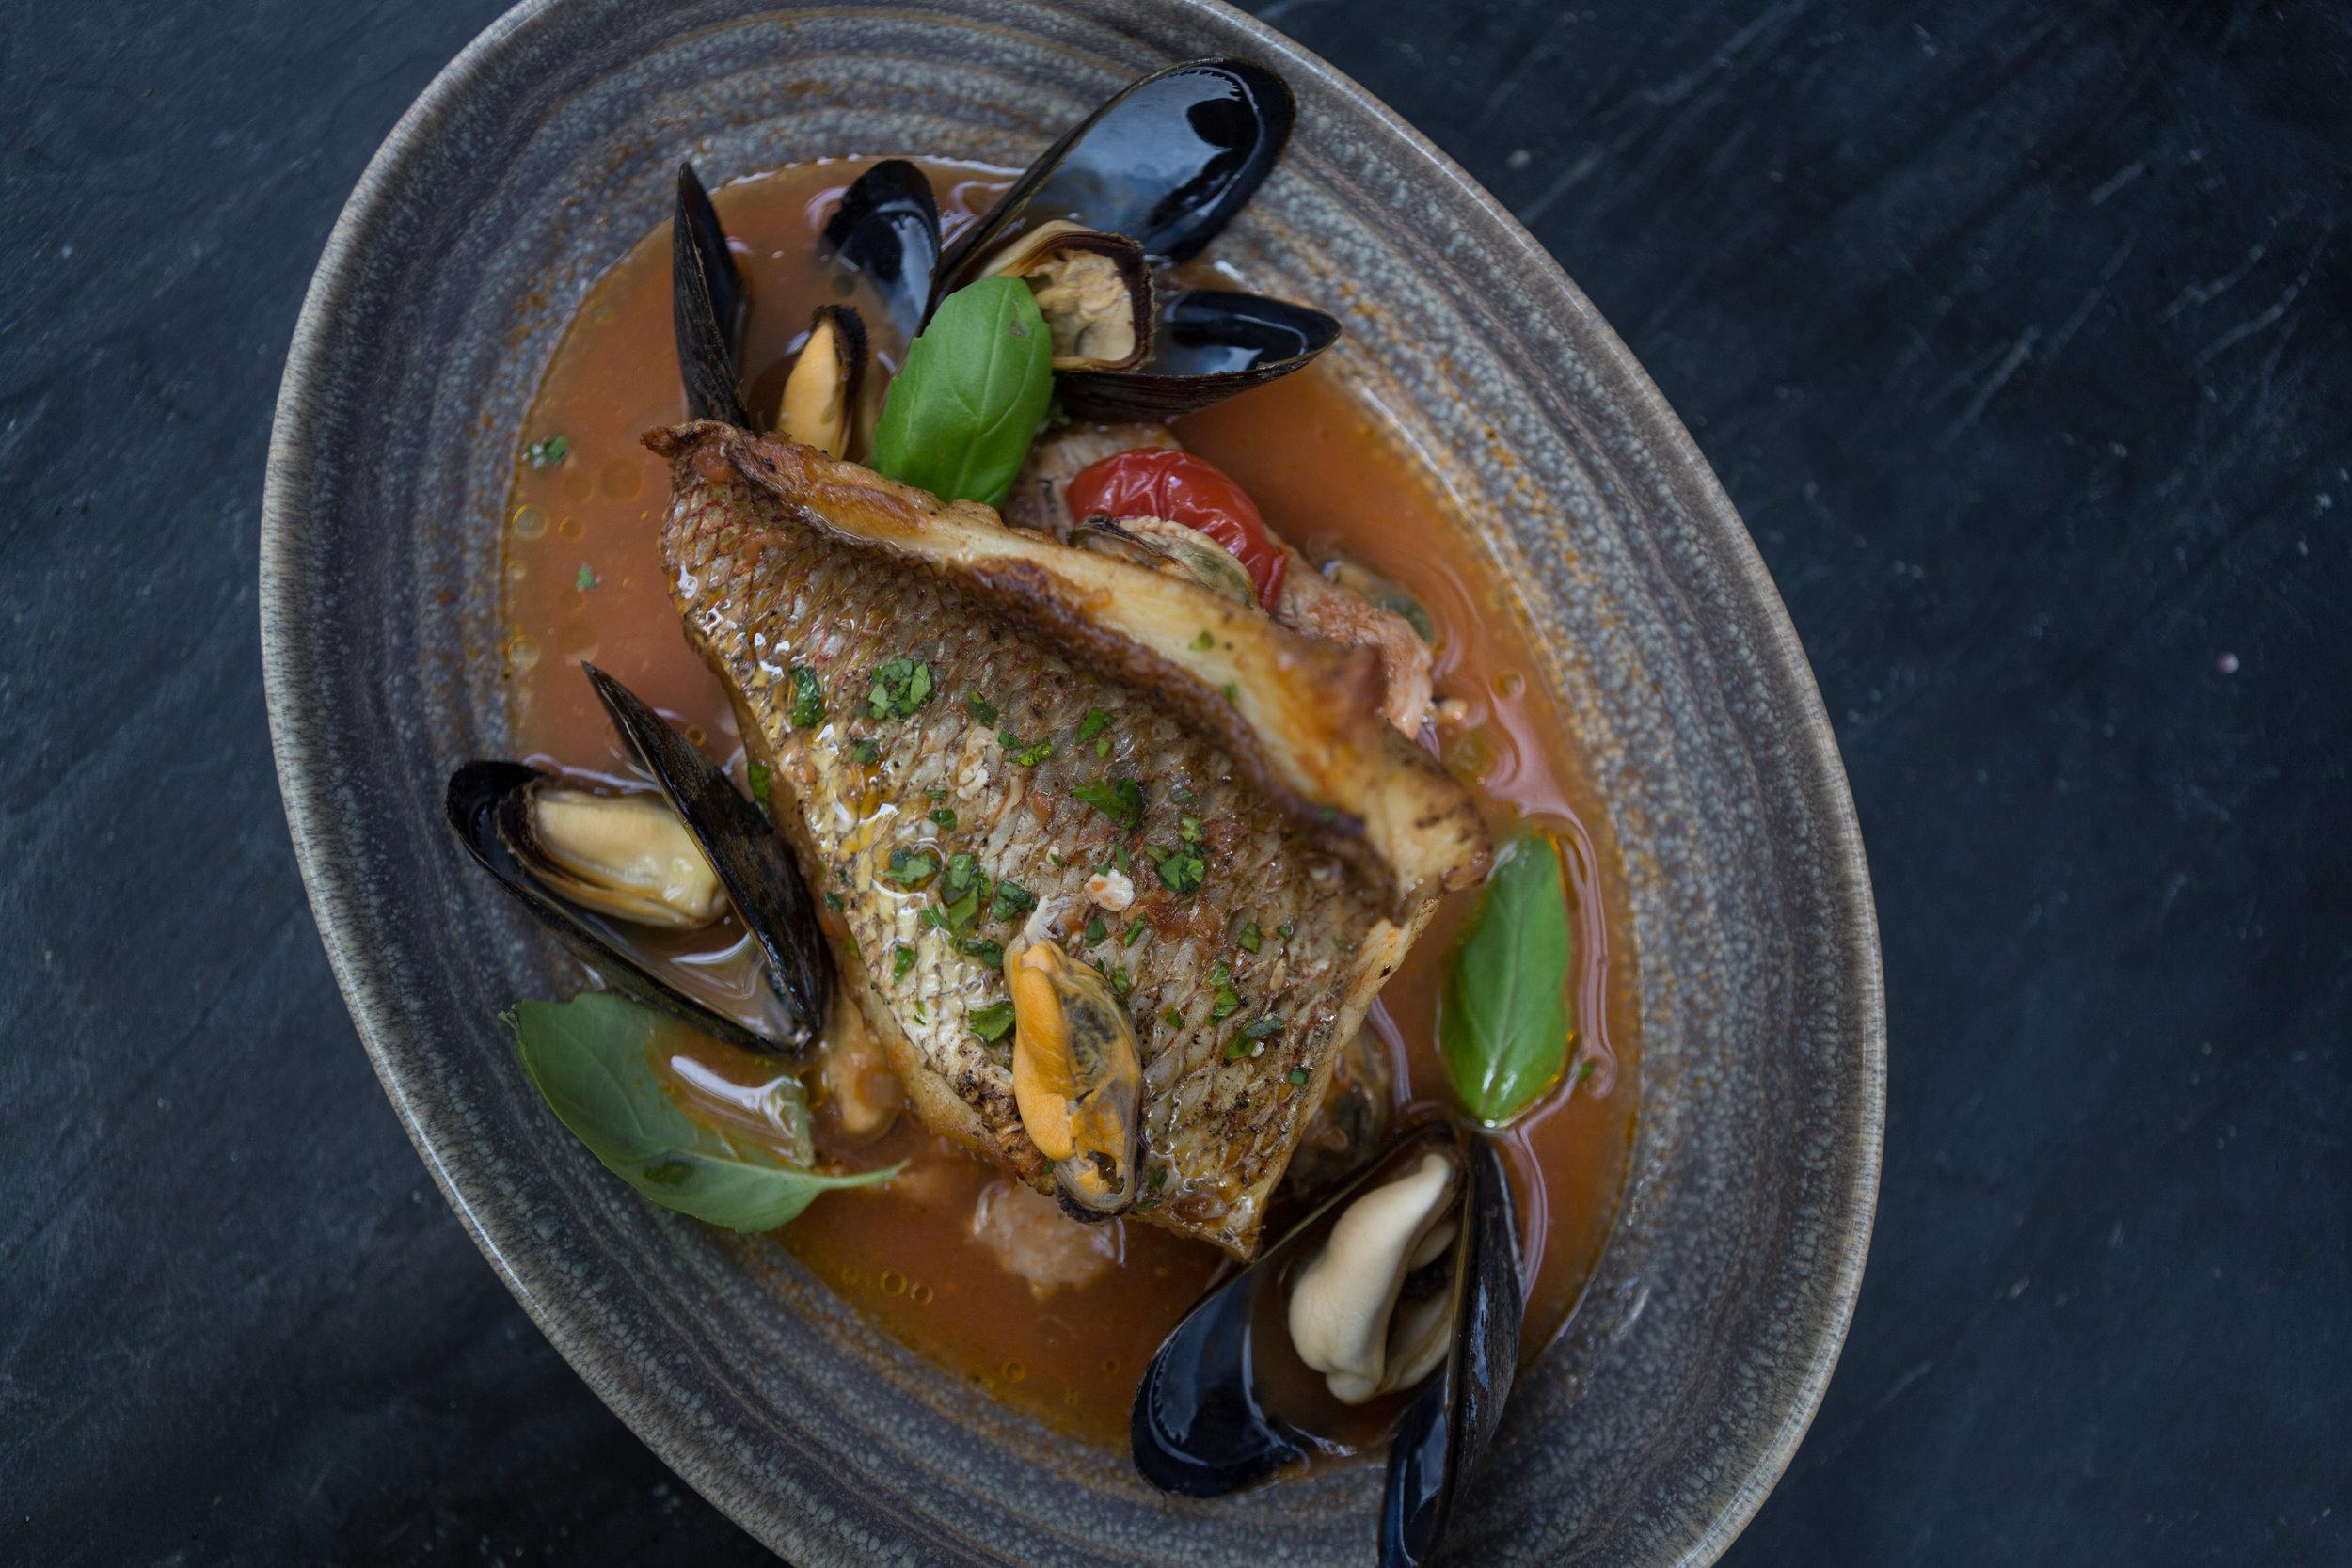 PIXELLAB_Feastly_ChefMirkoPaderno-2912.jpg